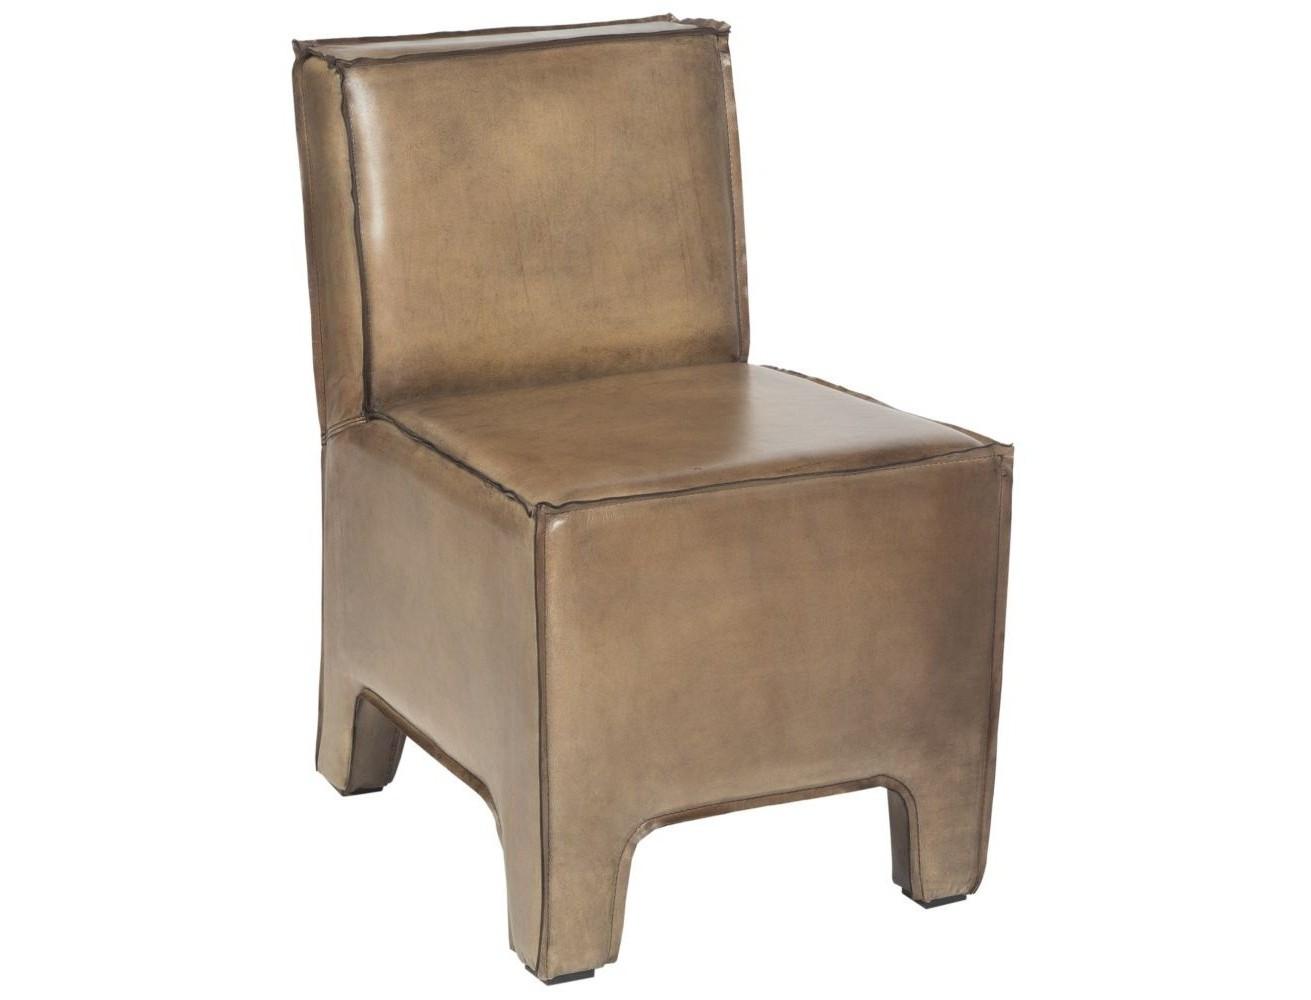 СтулОбеденные стулья<br><br><br>Material: Кожа<br>Width см: 51<br>Depth см: 65<br>Height см: 81